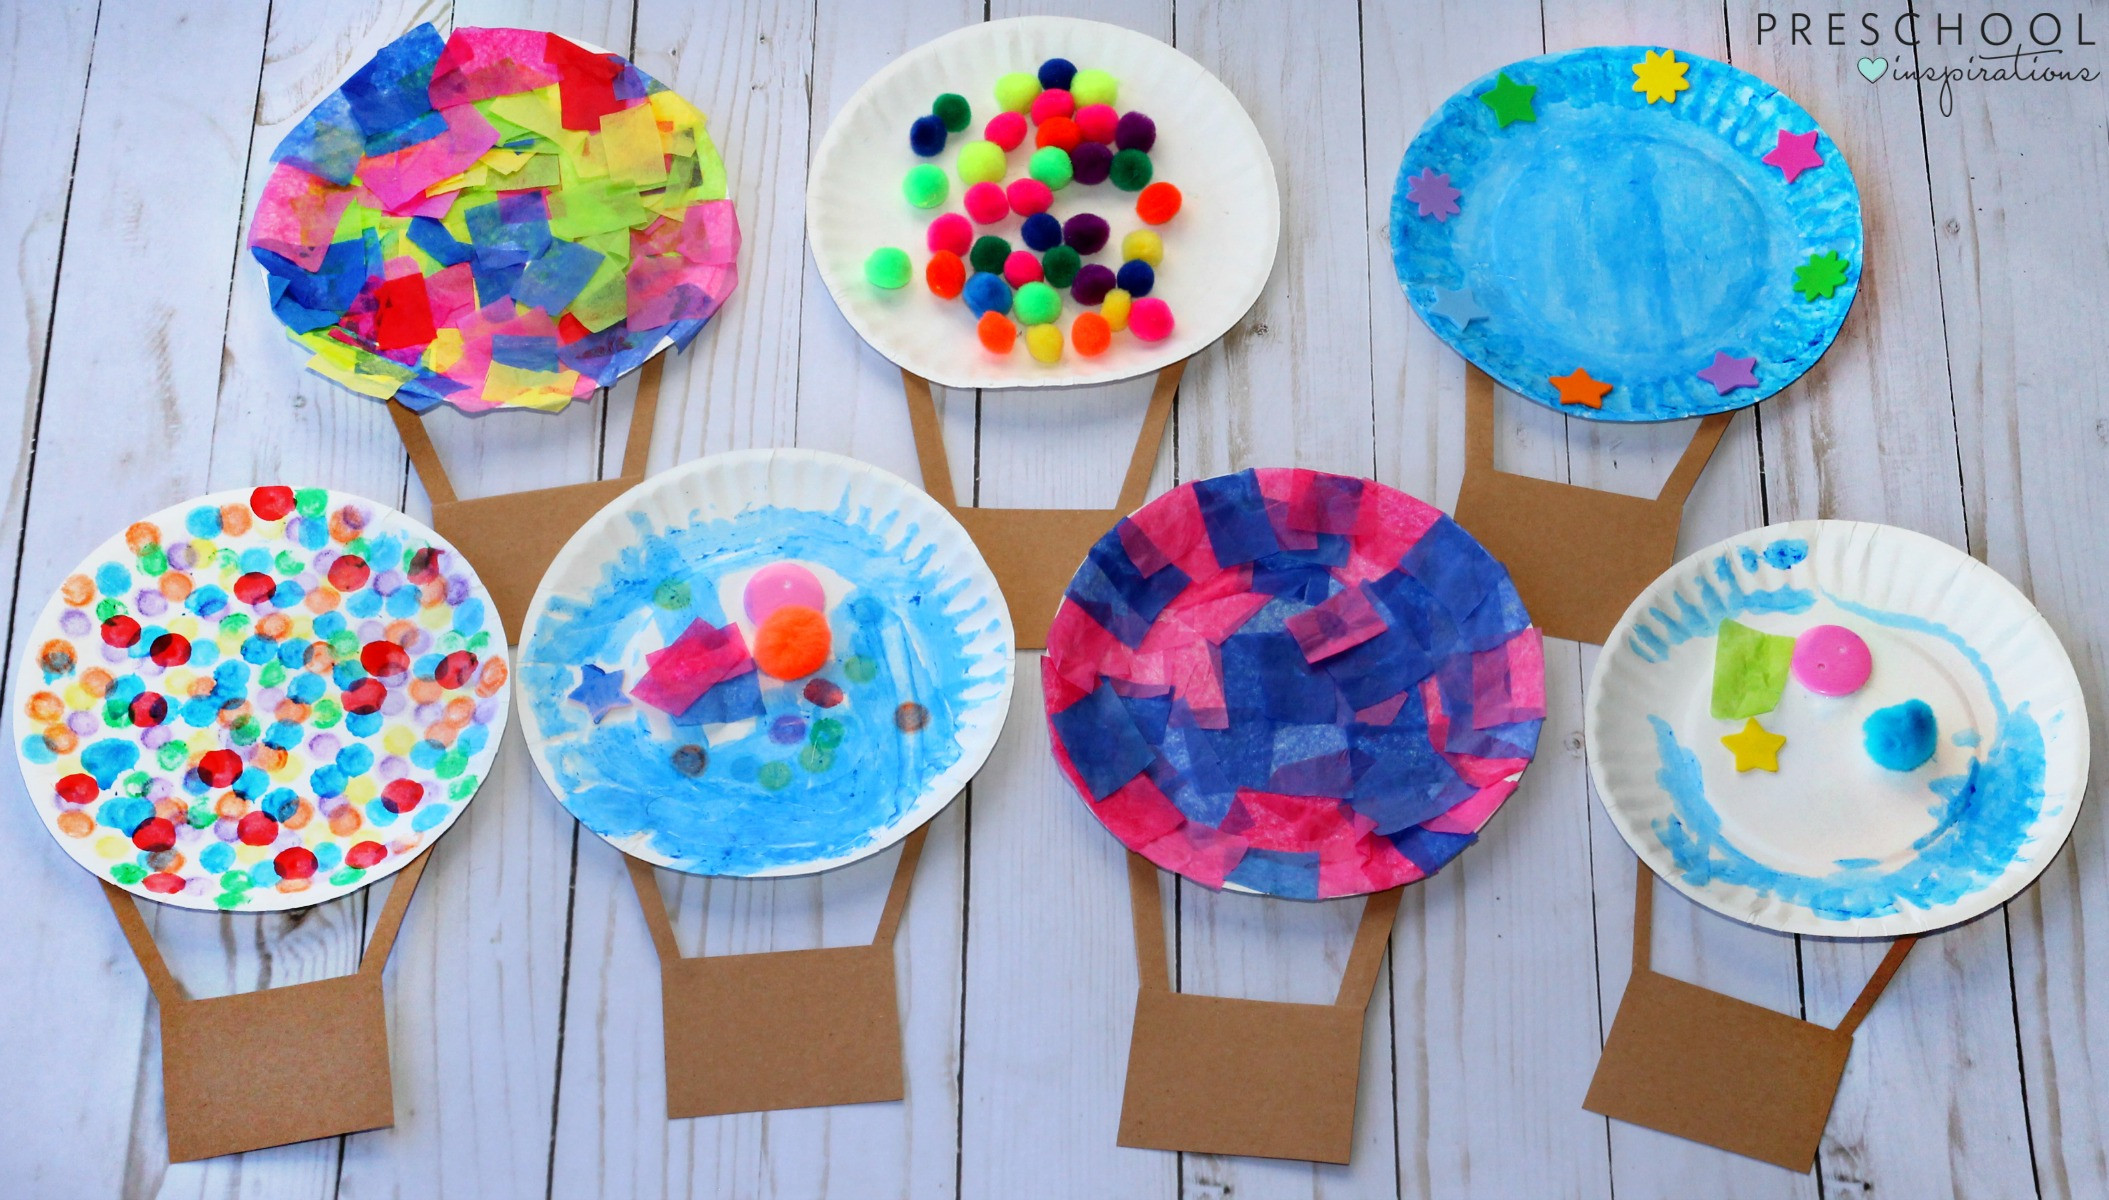 Arts And Crafts For Preschool  Hot Air Balloon Art Activity Preschool Inspirations